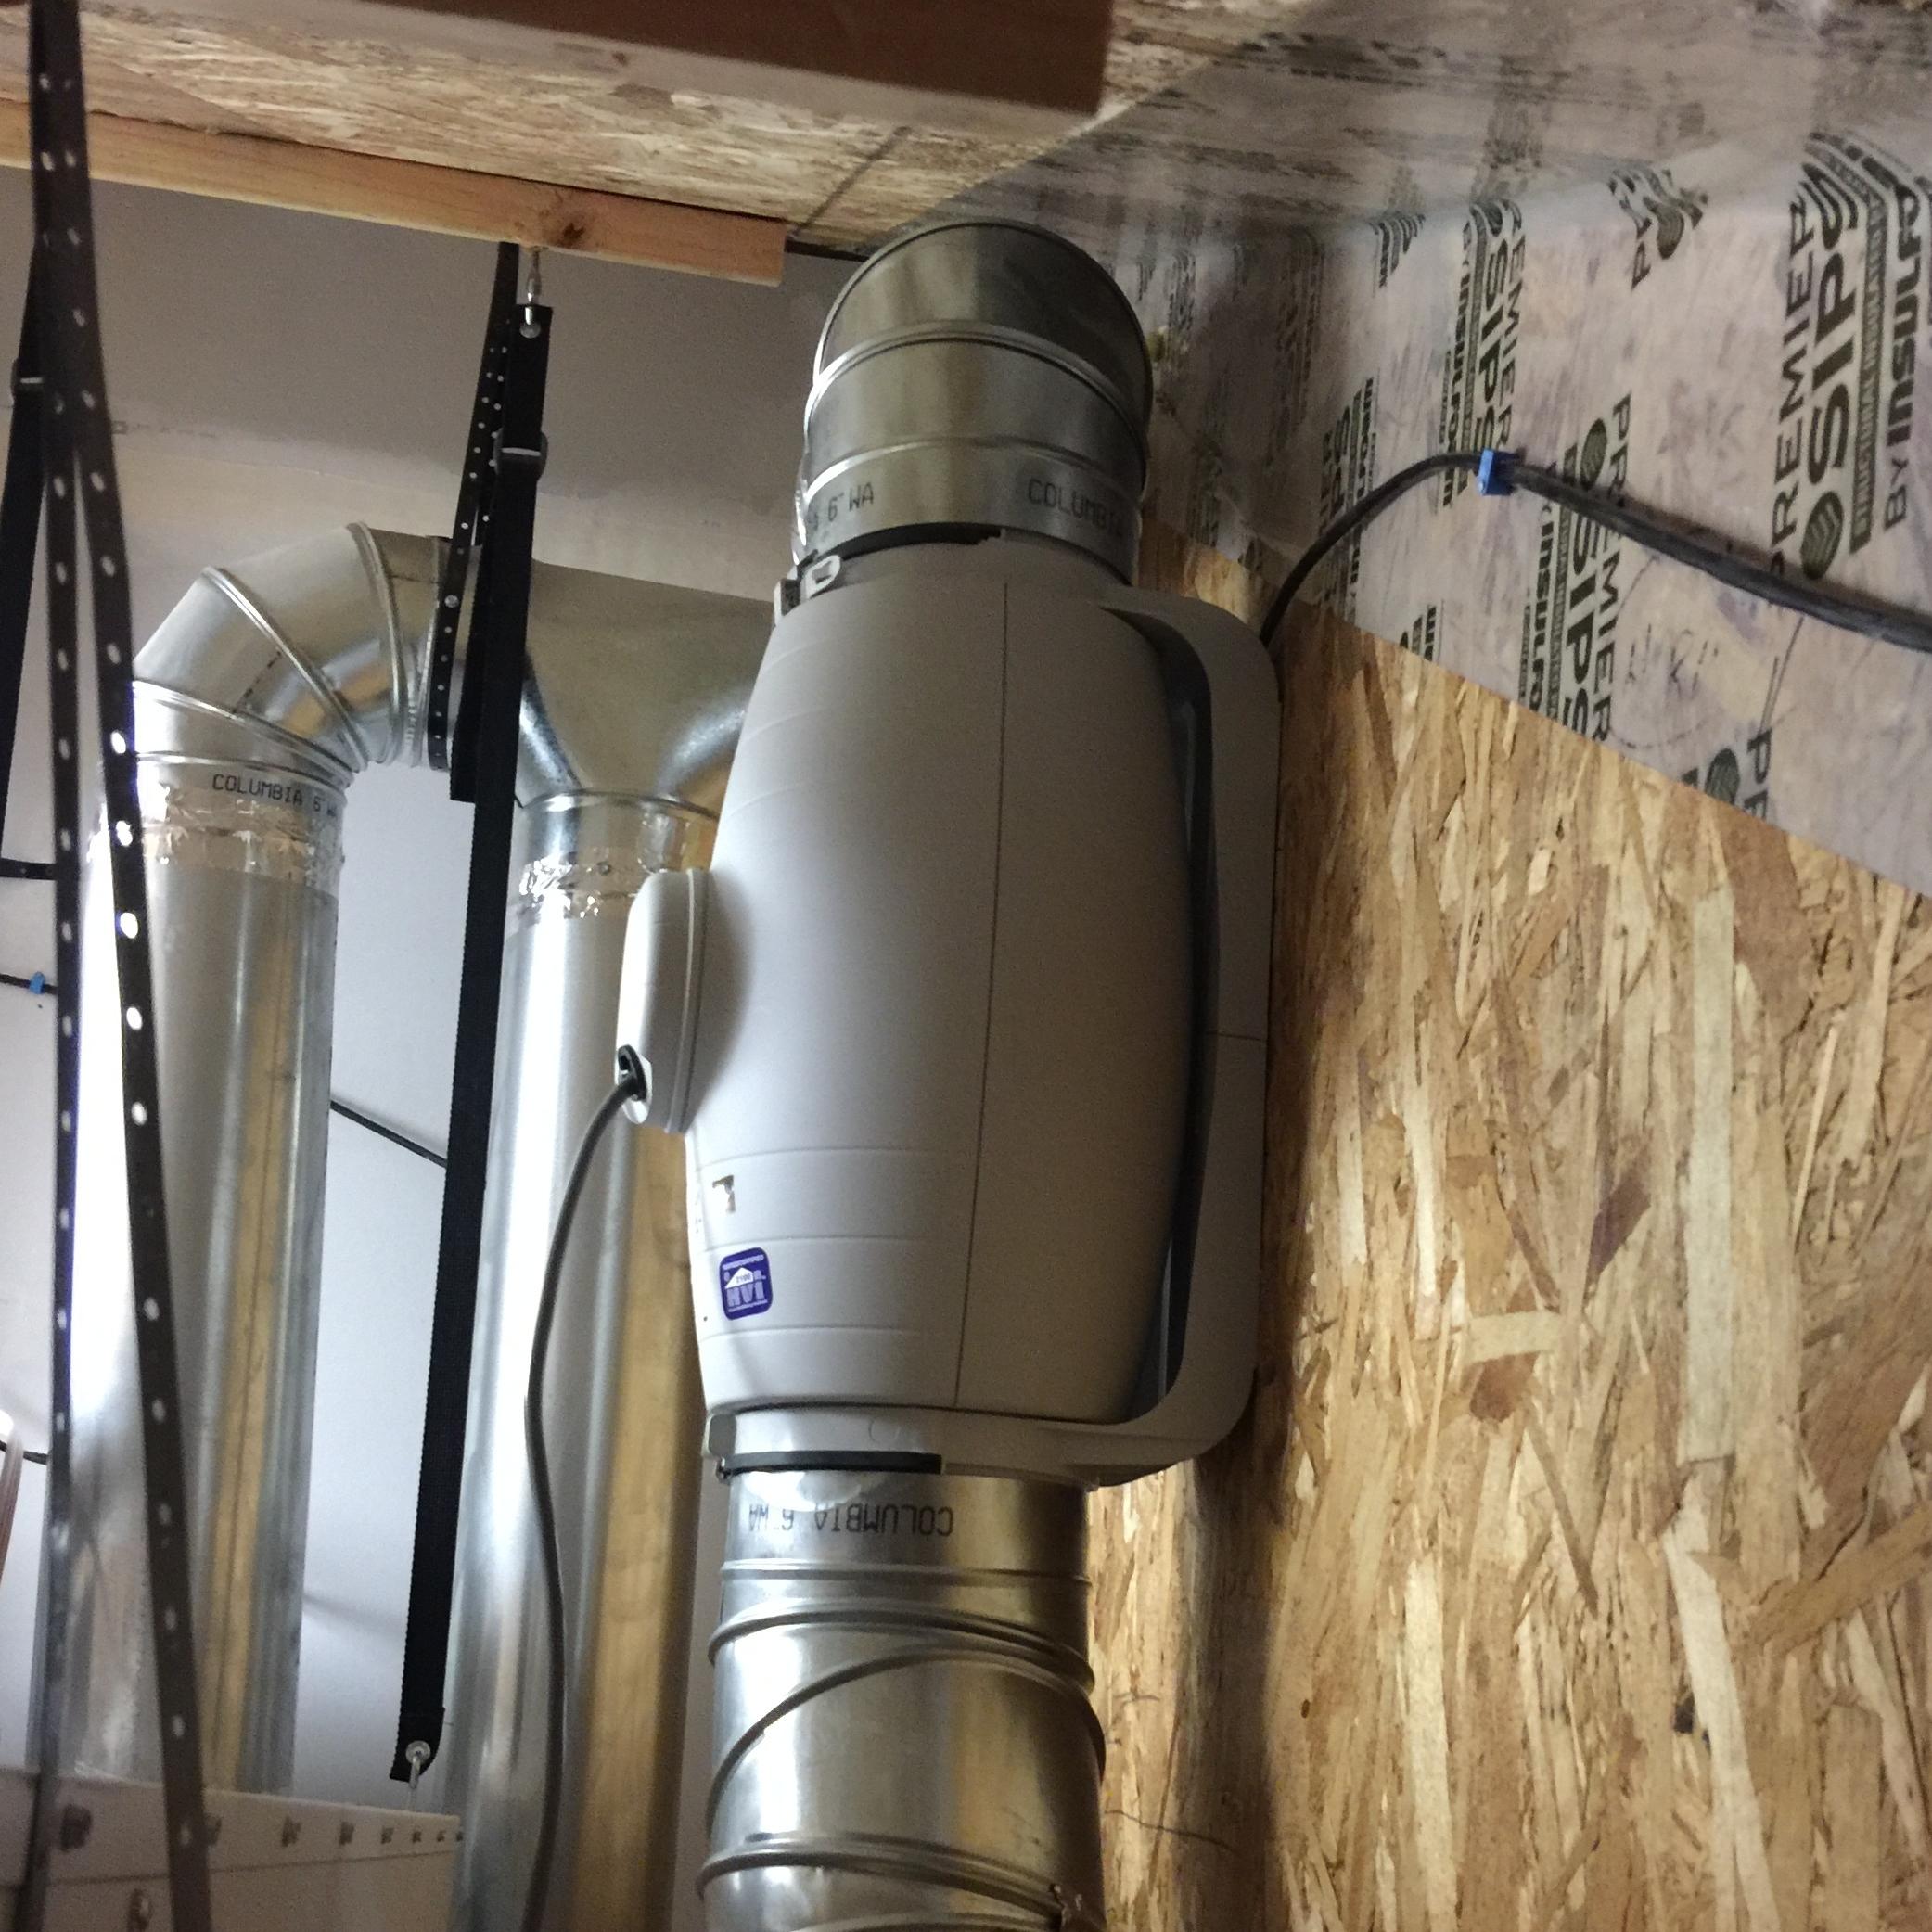 Our super-quite S&P Silent Series exhaust fan.